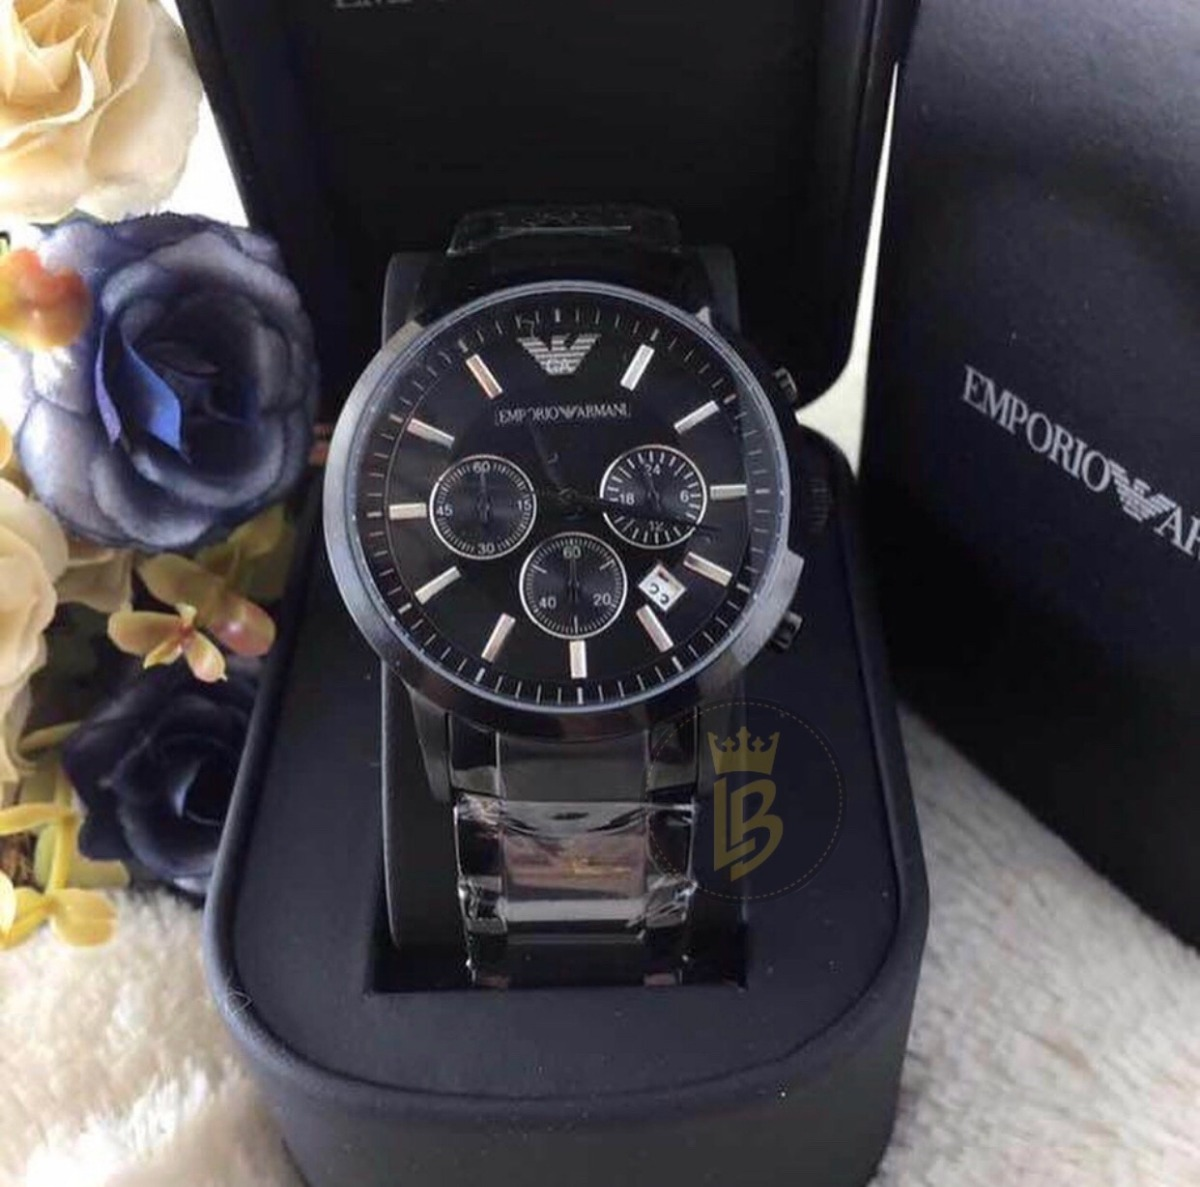 d57a242d6a6 relógio empório armani ar2453 preto médio 43mm completo. Carregando zoom.